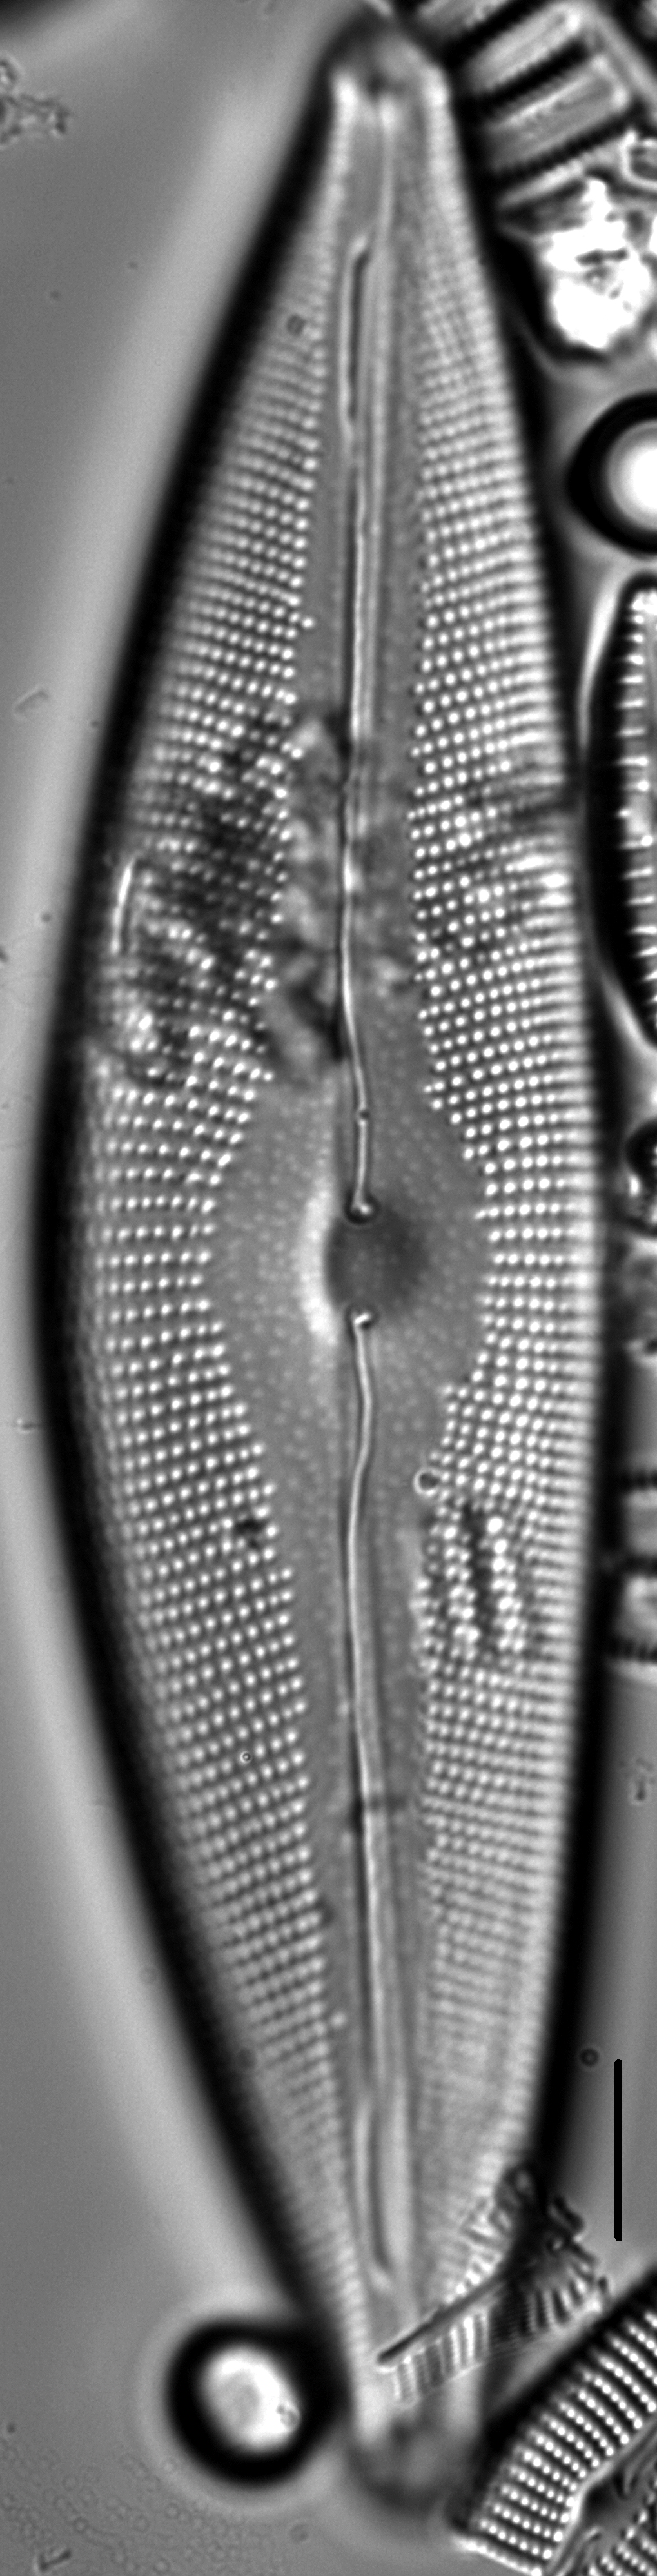 Cymbopleura crassipunctata LM1